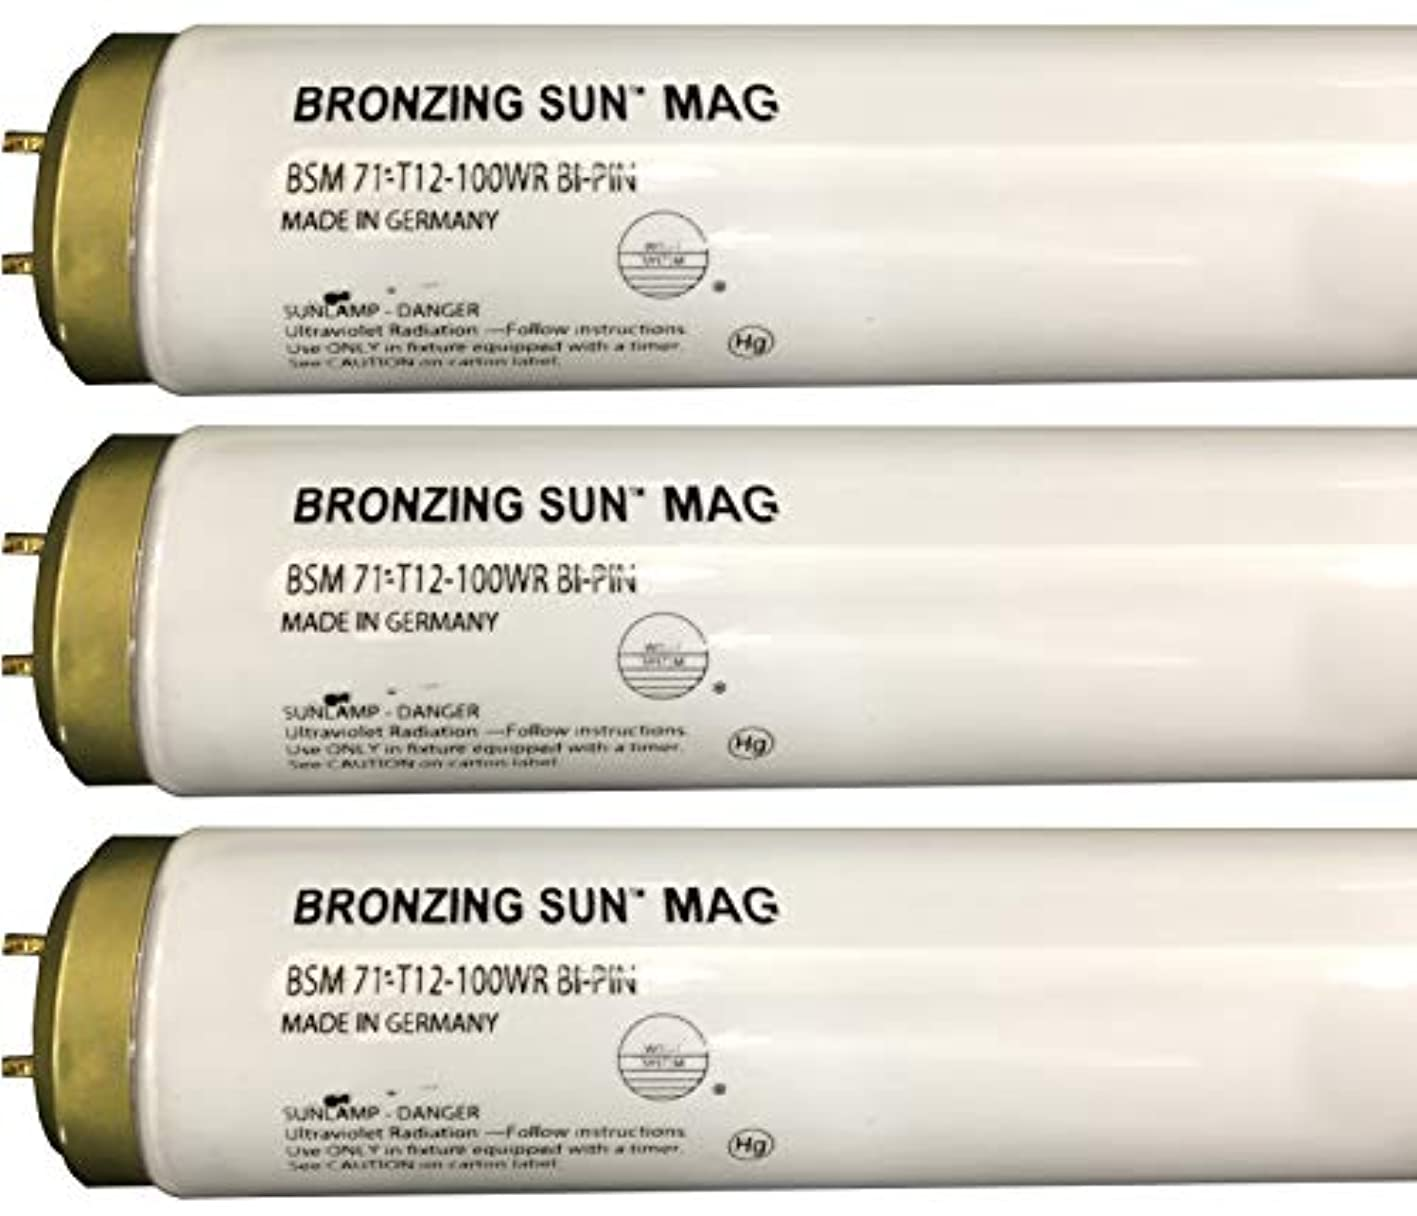 Wolff Bronzing Sun Magnum fr71 Ho 100 W BiピンReflector Tanningランプ T12 27248